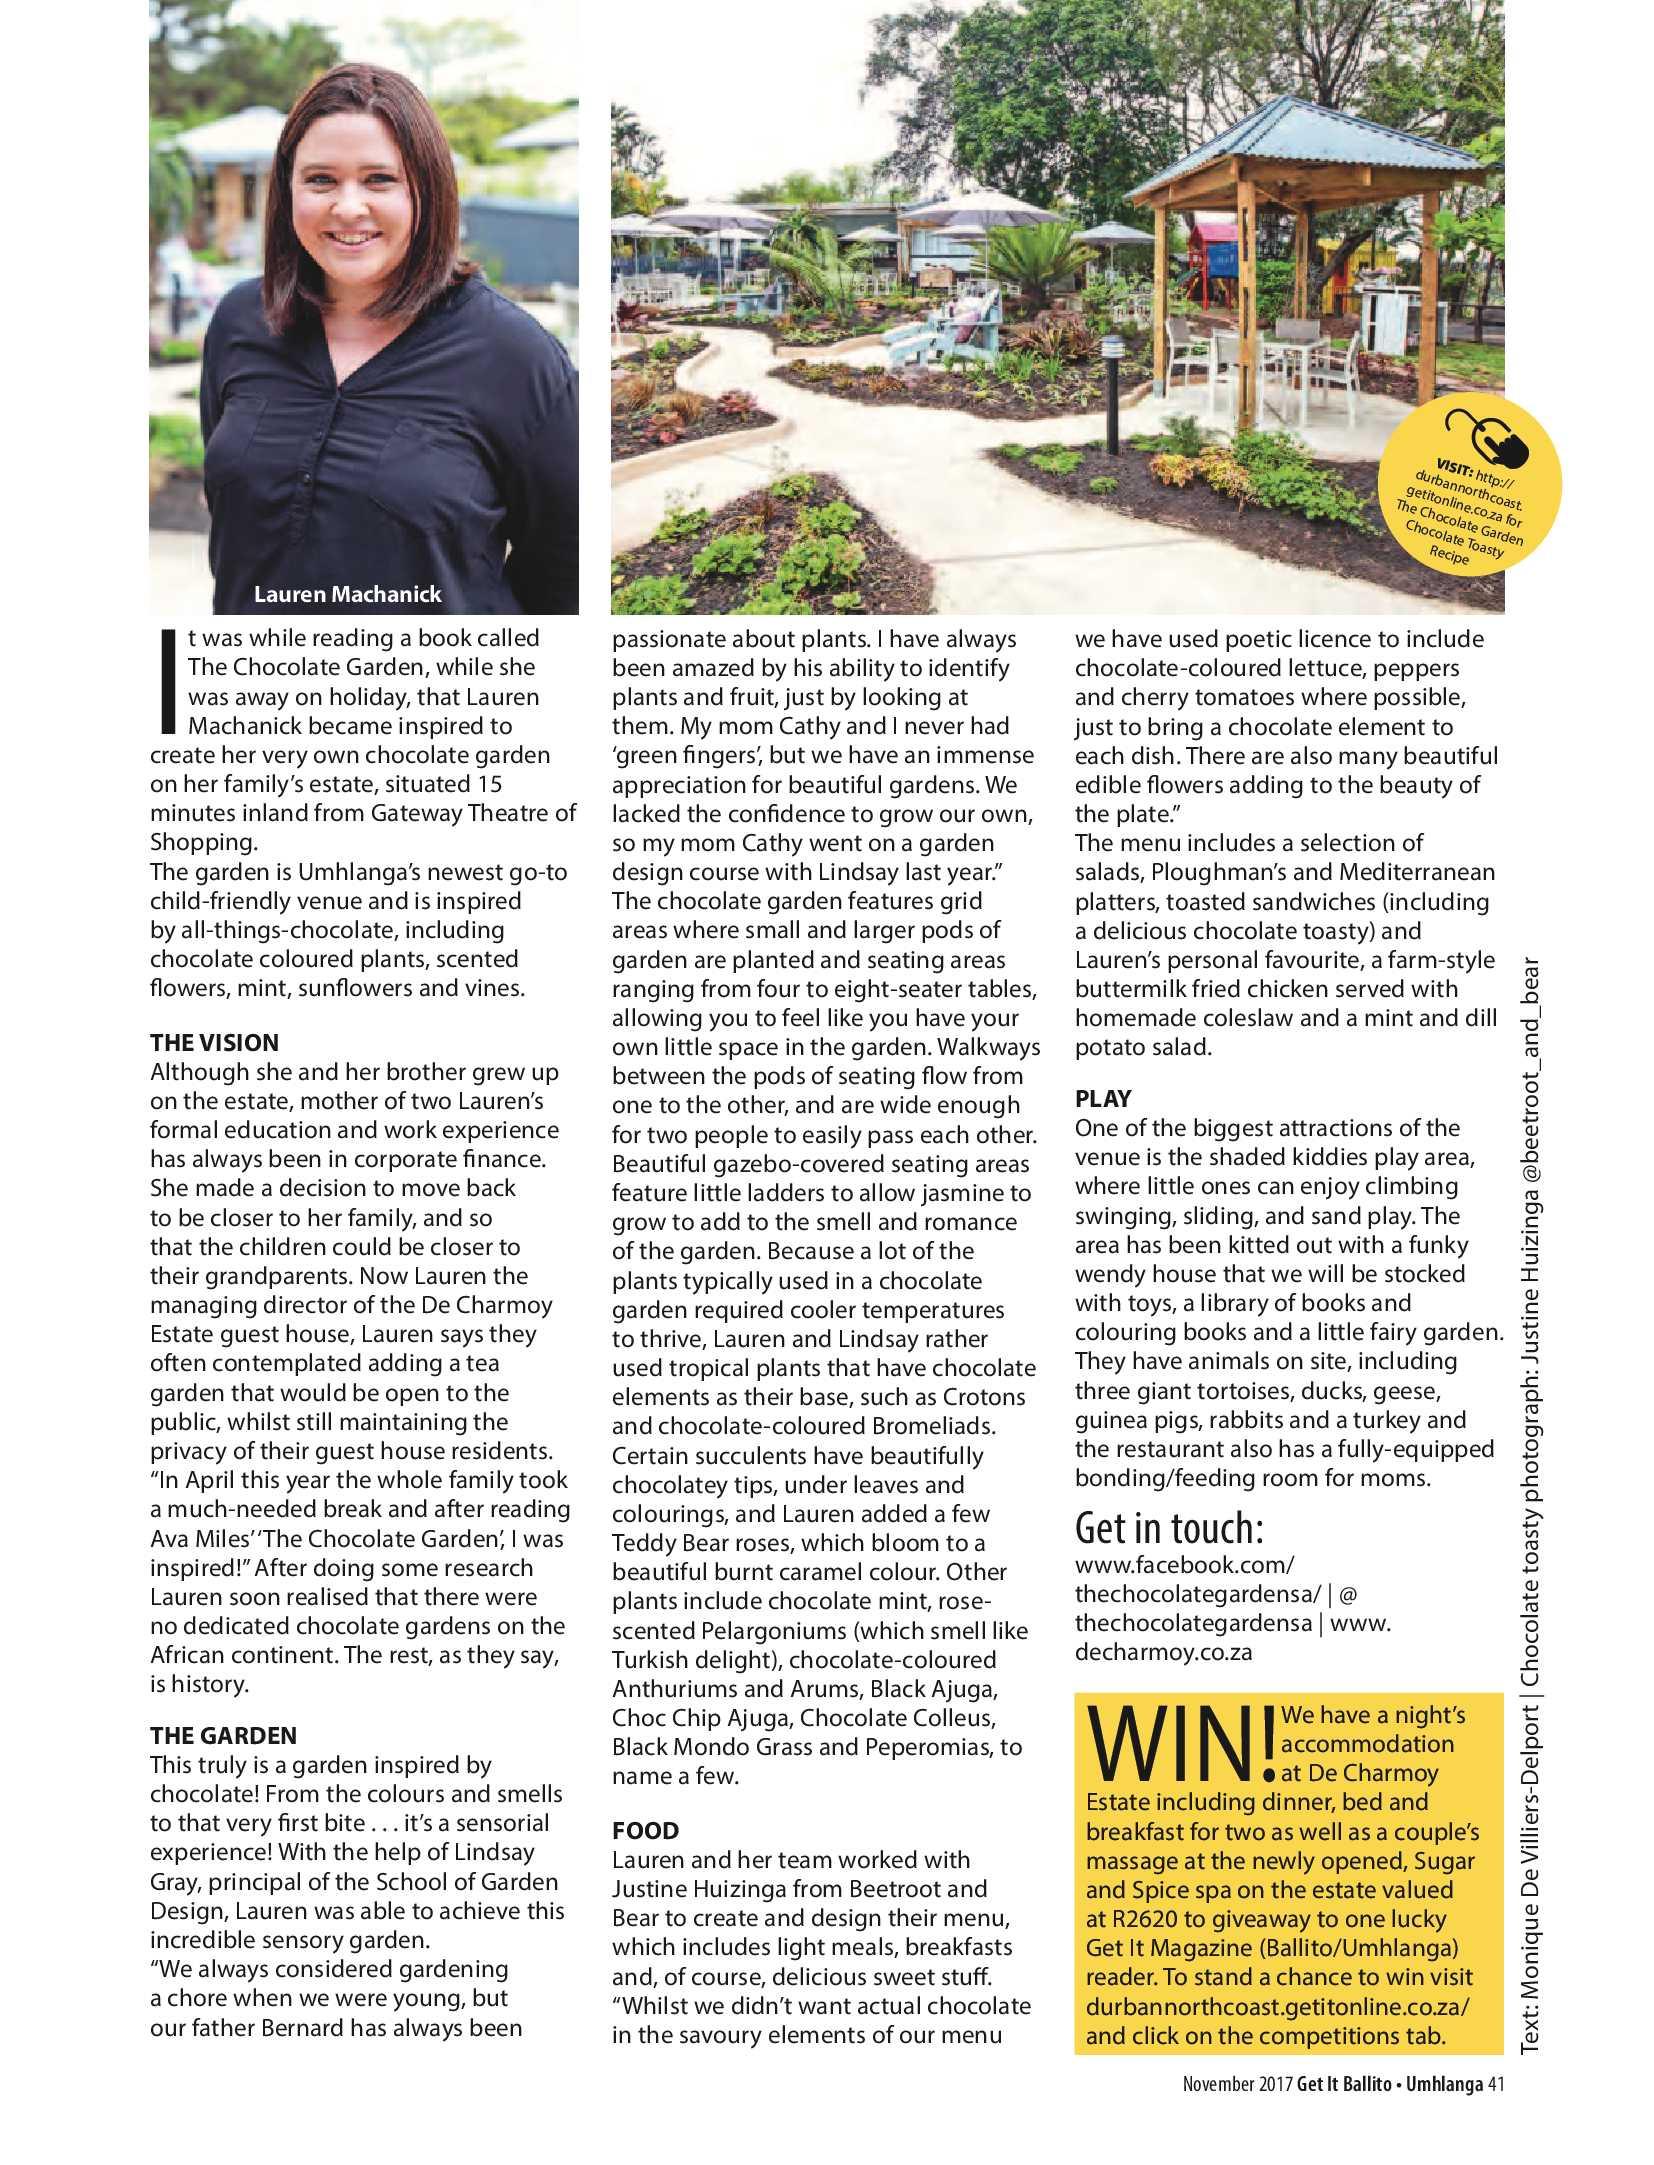 get-magazine-ballitoumhlanga-november-2017-2-epapers-page-43